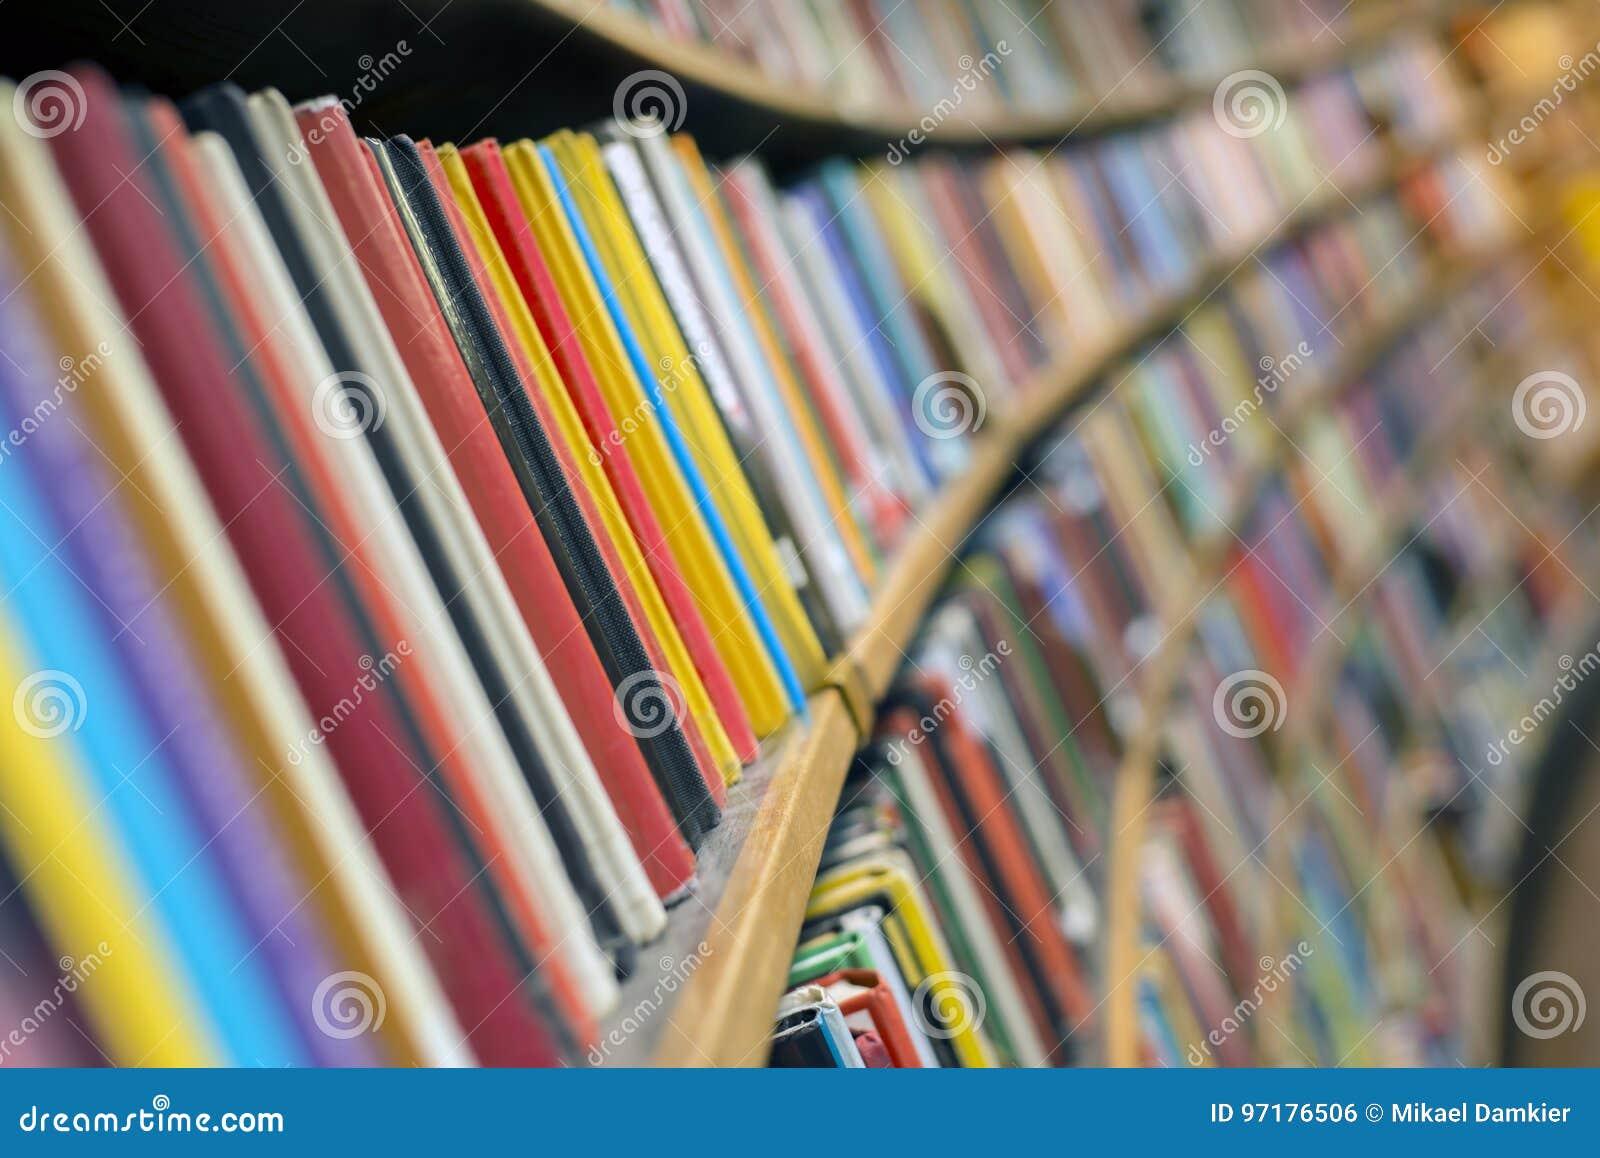 Download Library books stock photo. Image of bookshelf, photo - 97176506